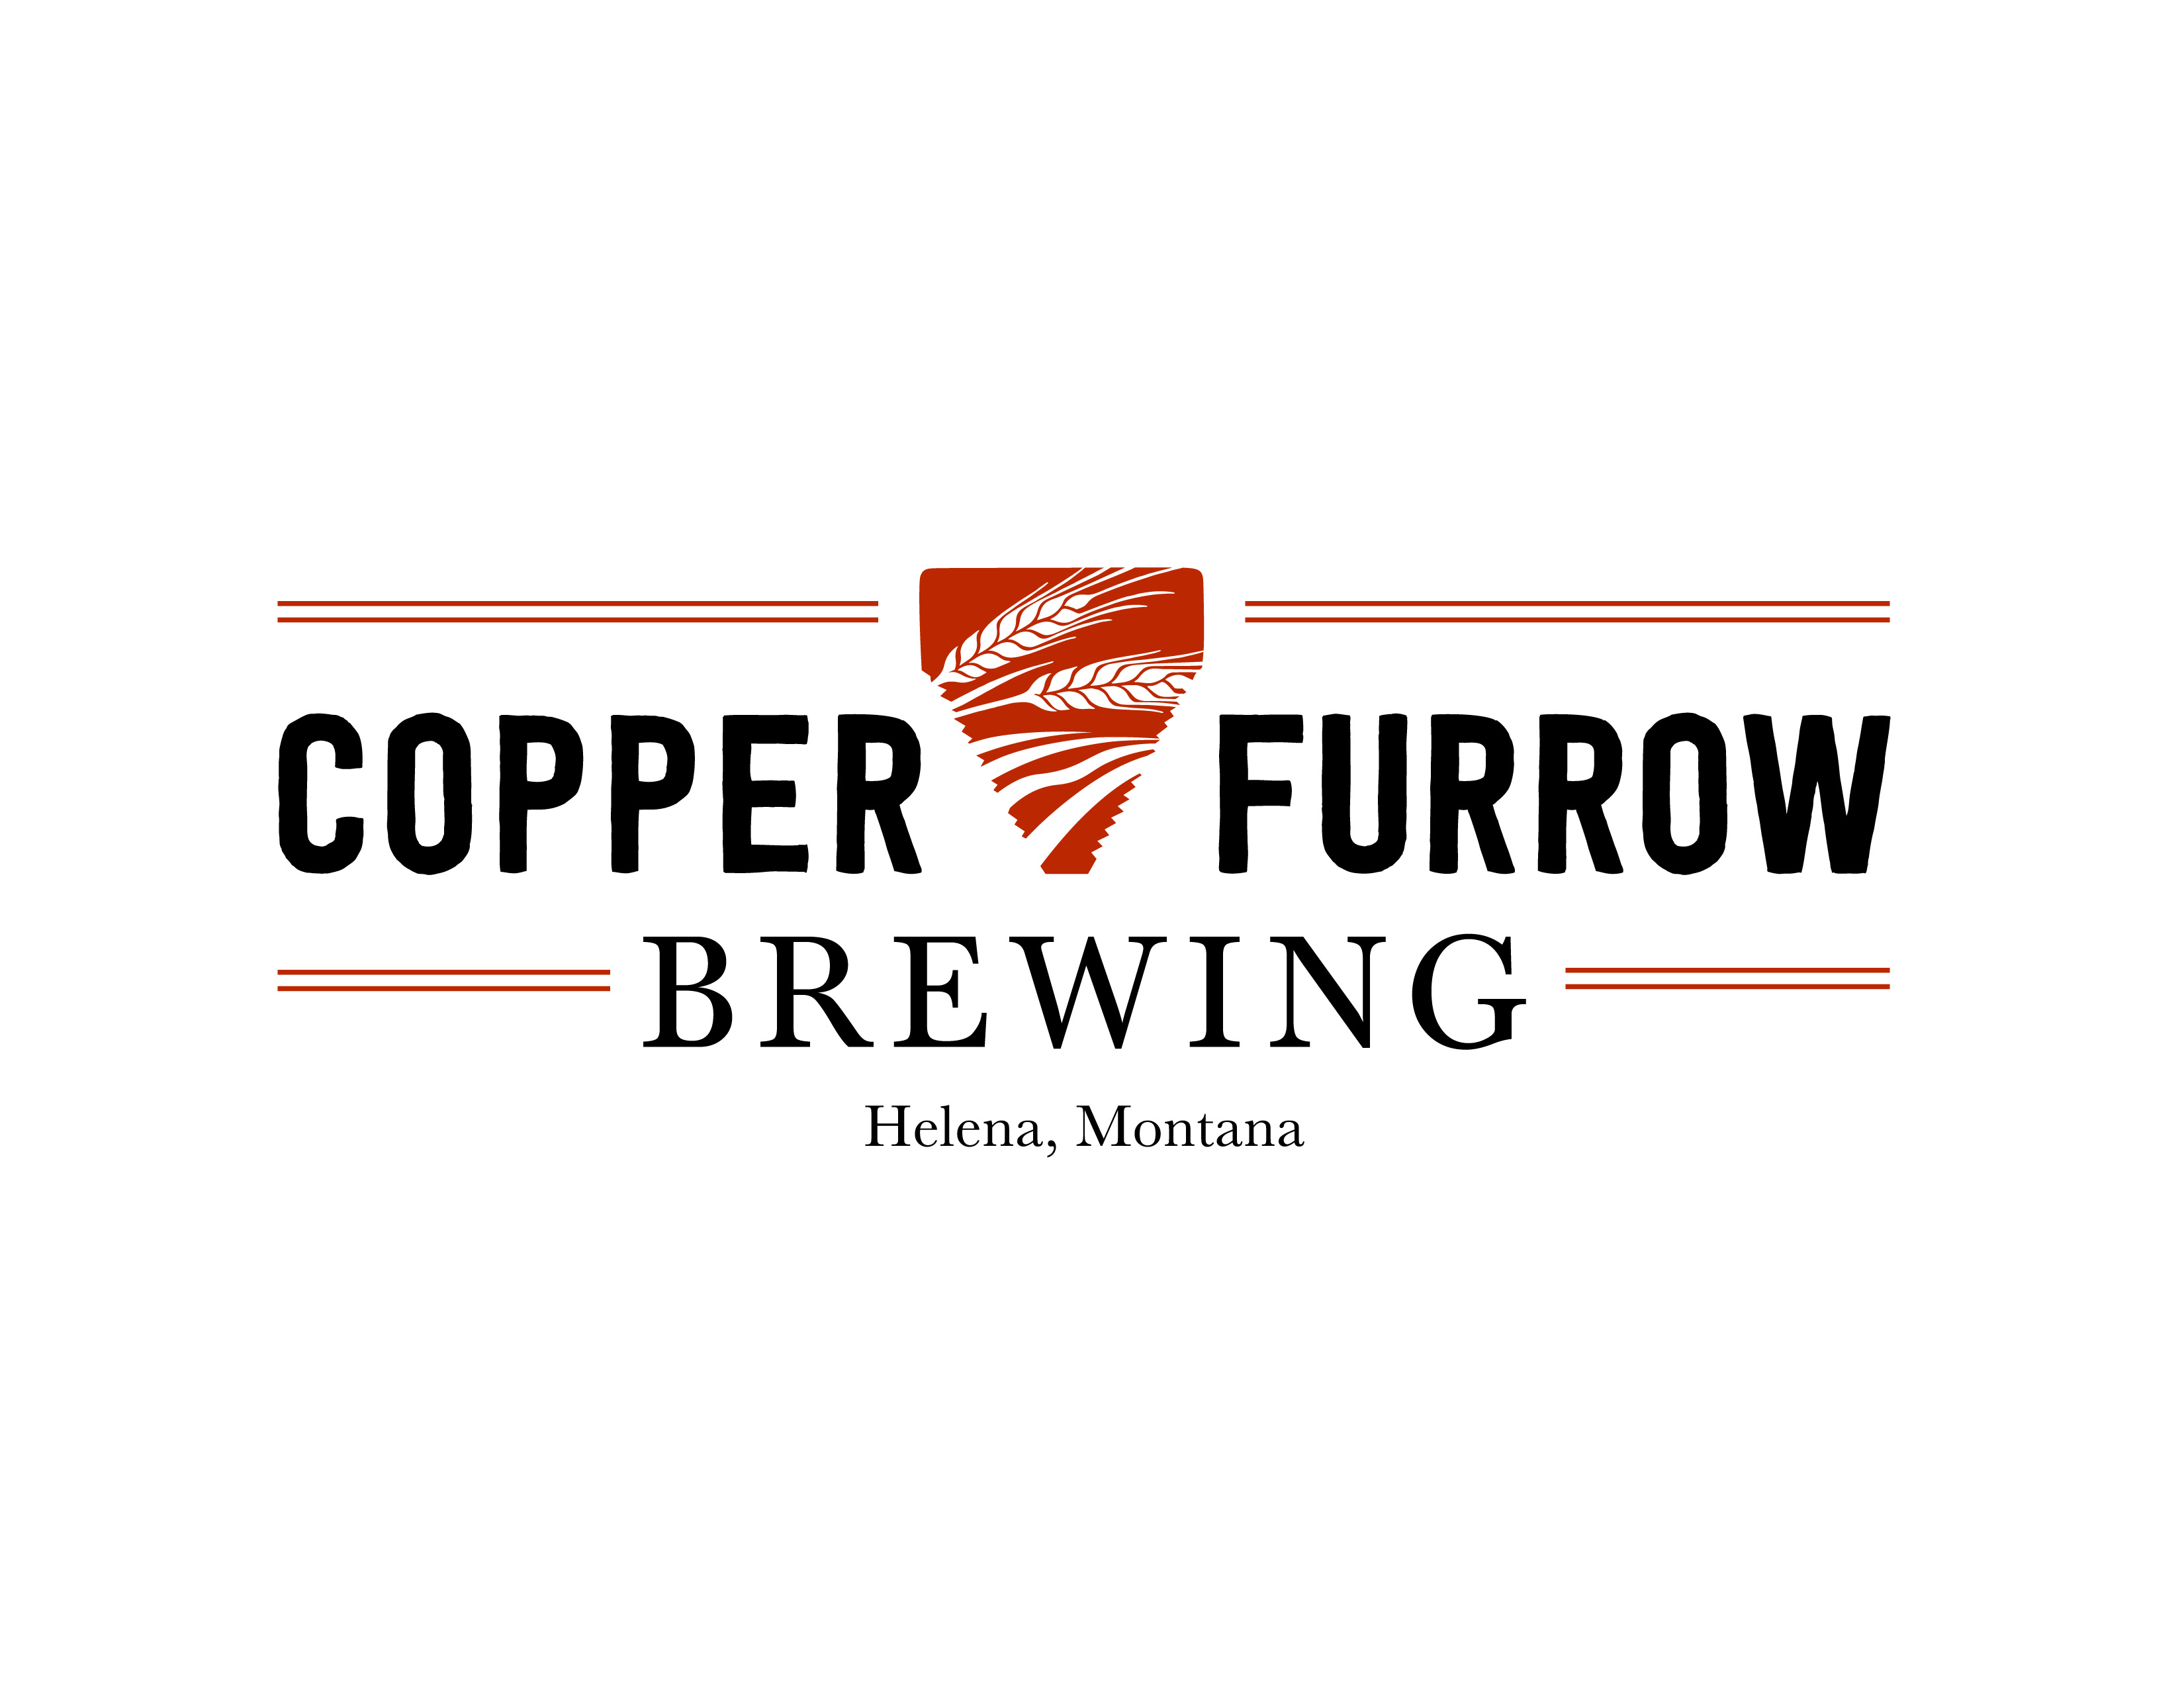 Copper Furrow Brewing